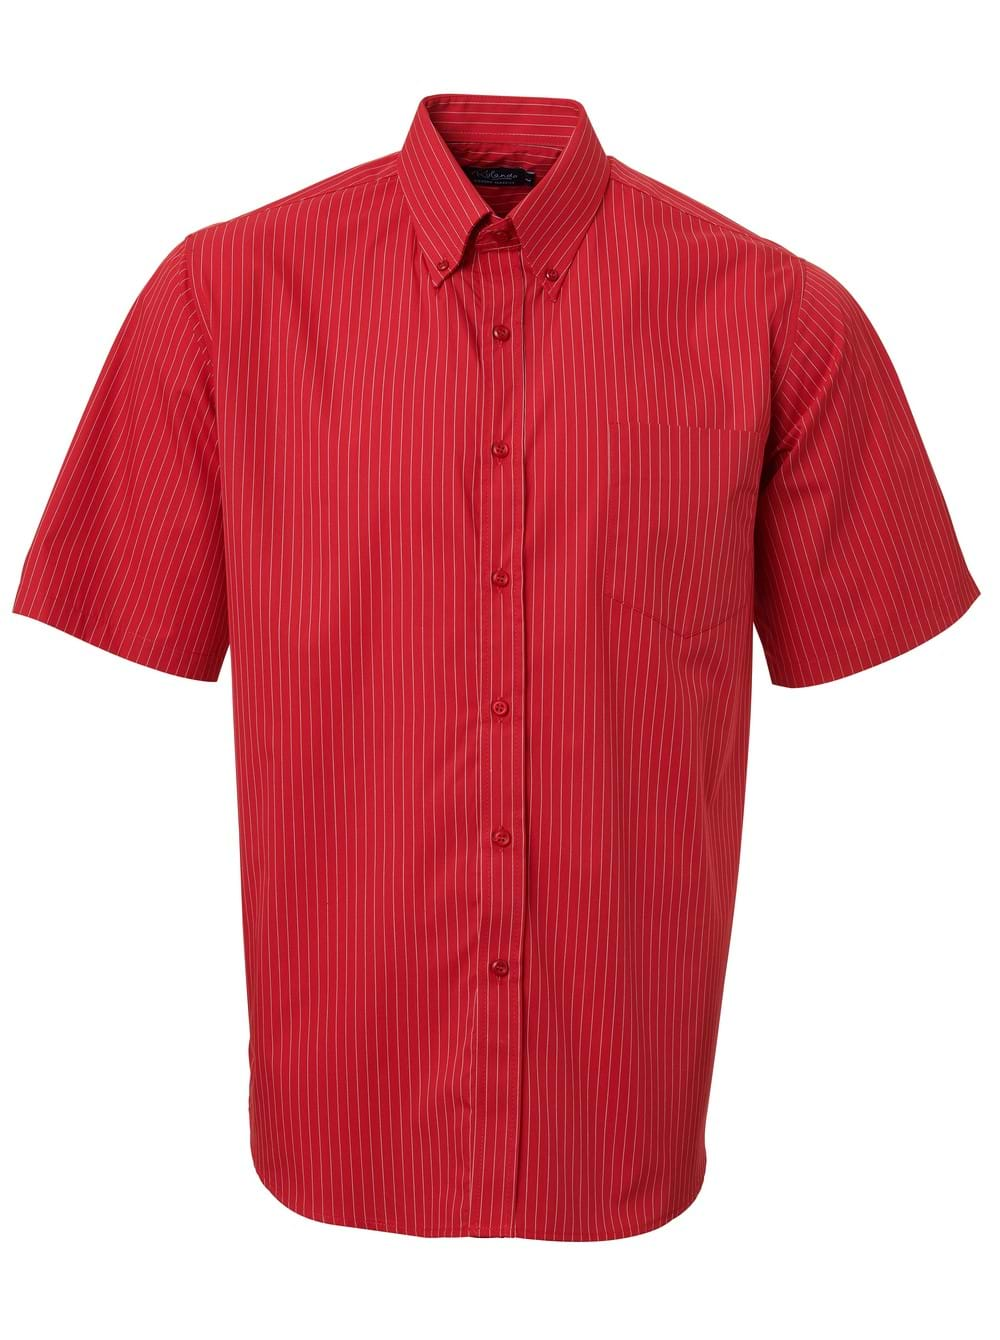 Mens Stripe Short Sleeve Shirt Red